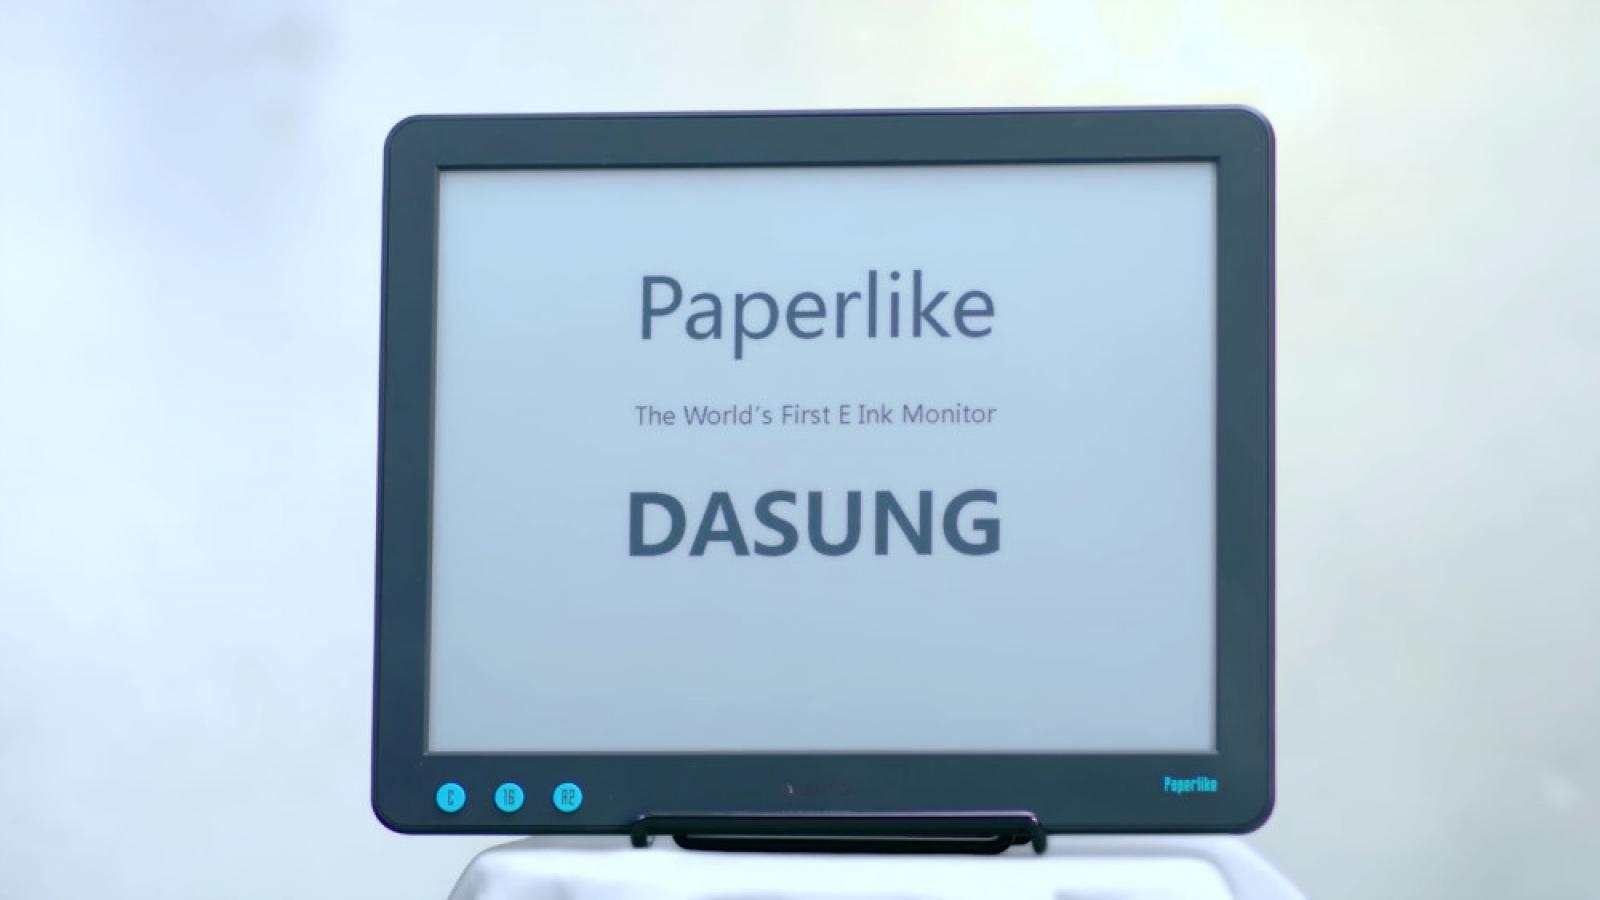 Paperlike